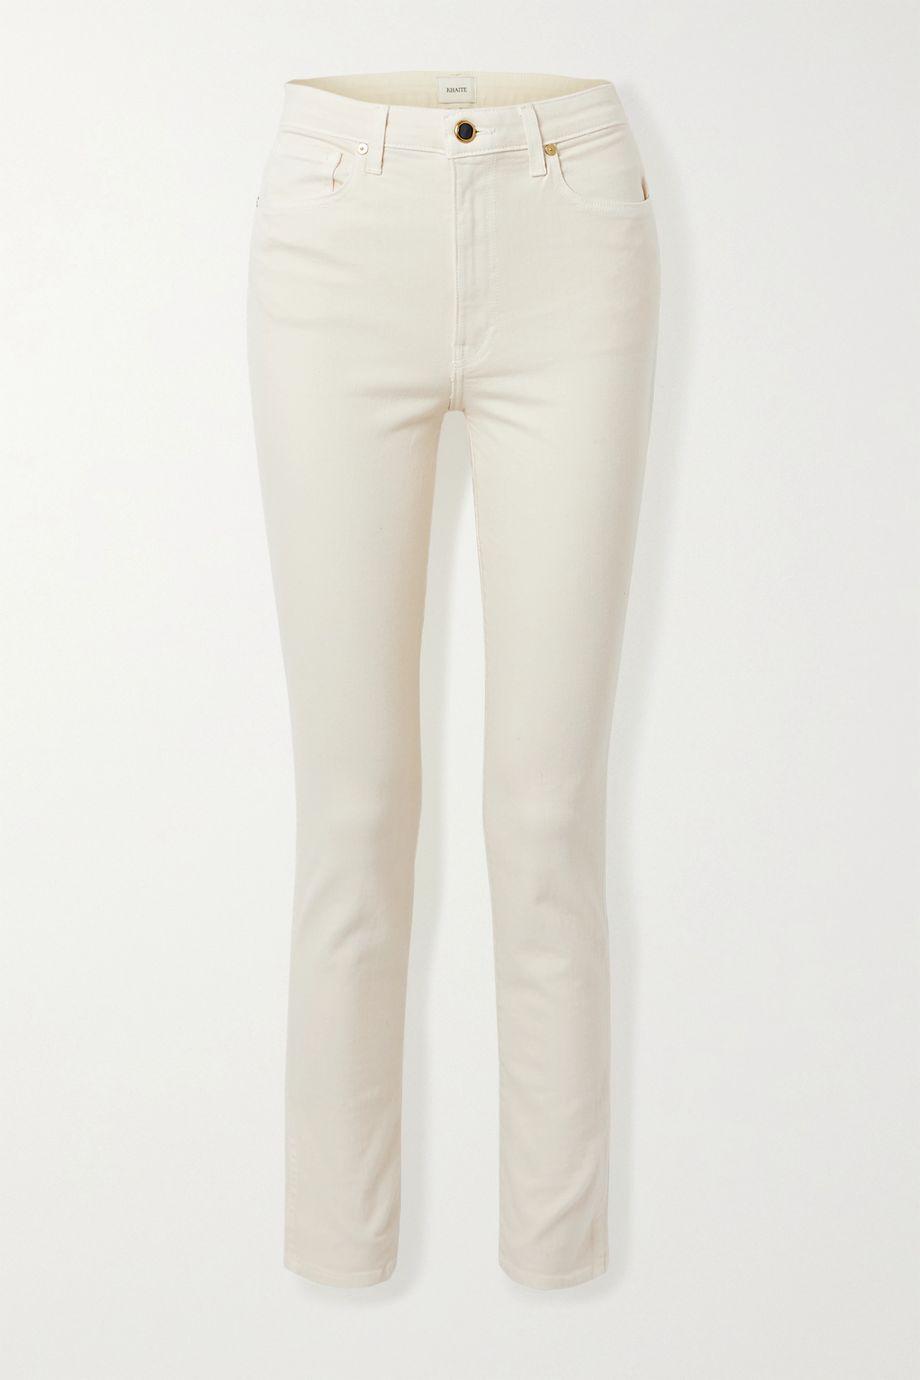 Khaite Vivian high-rise slim-leg jeans